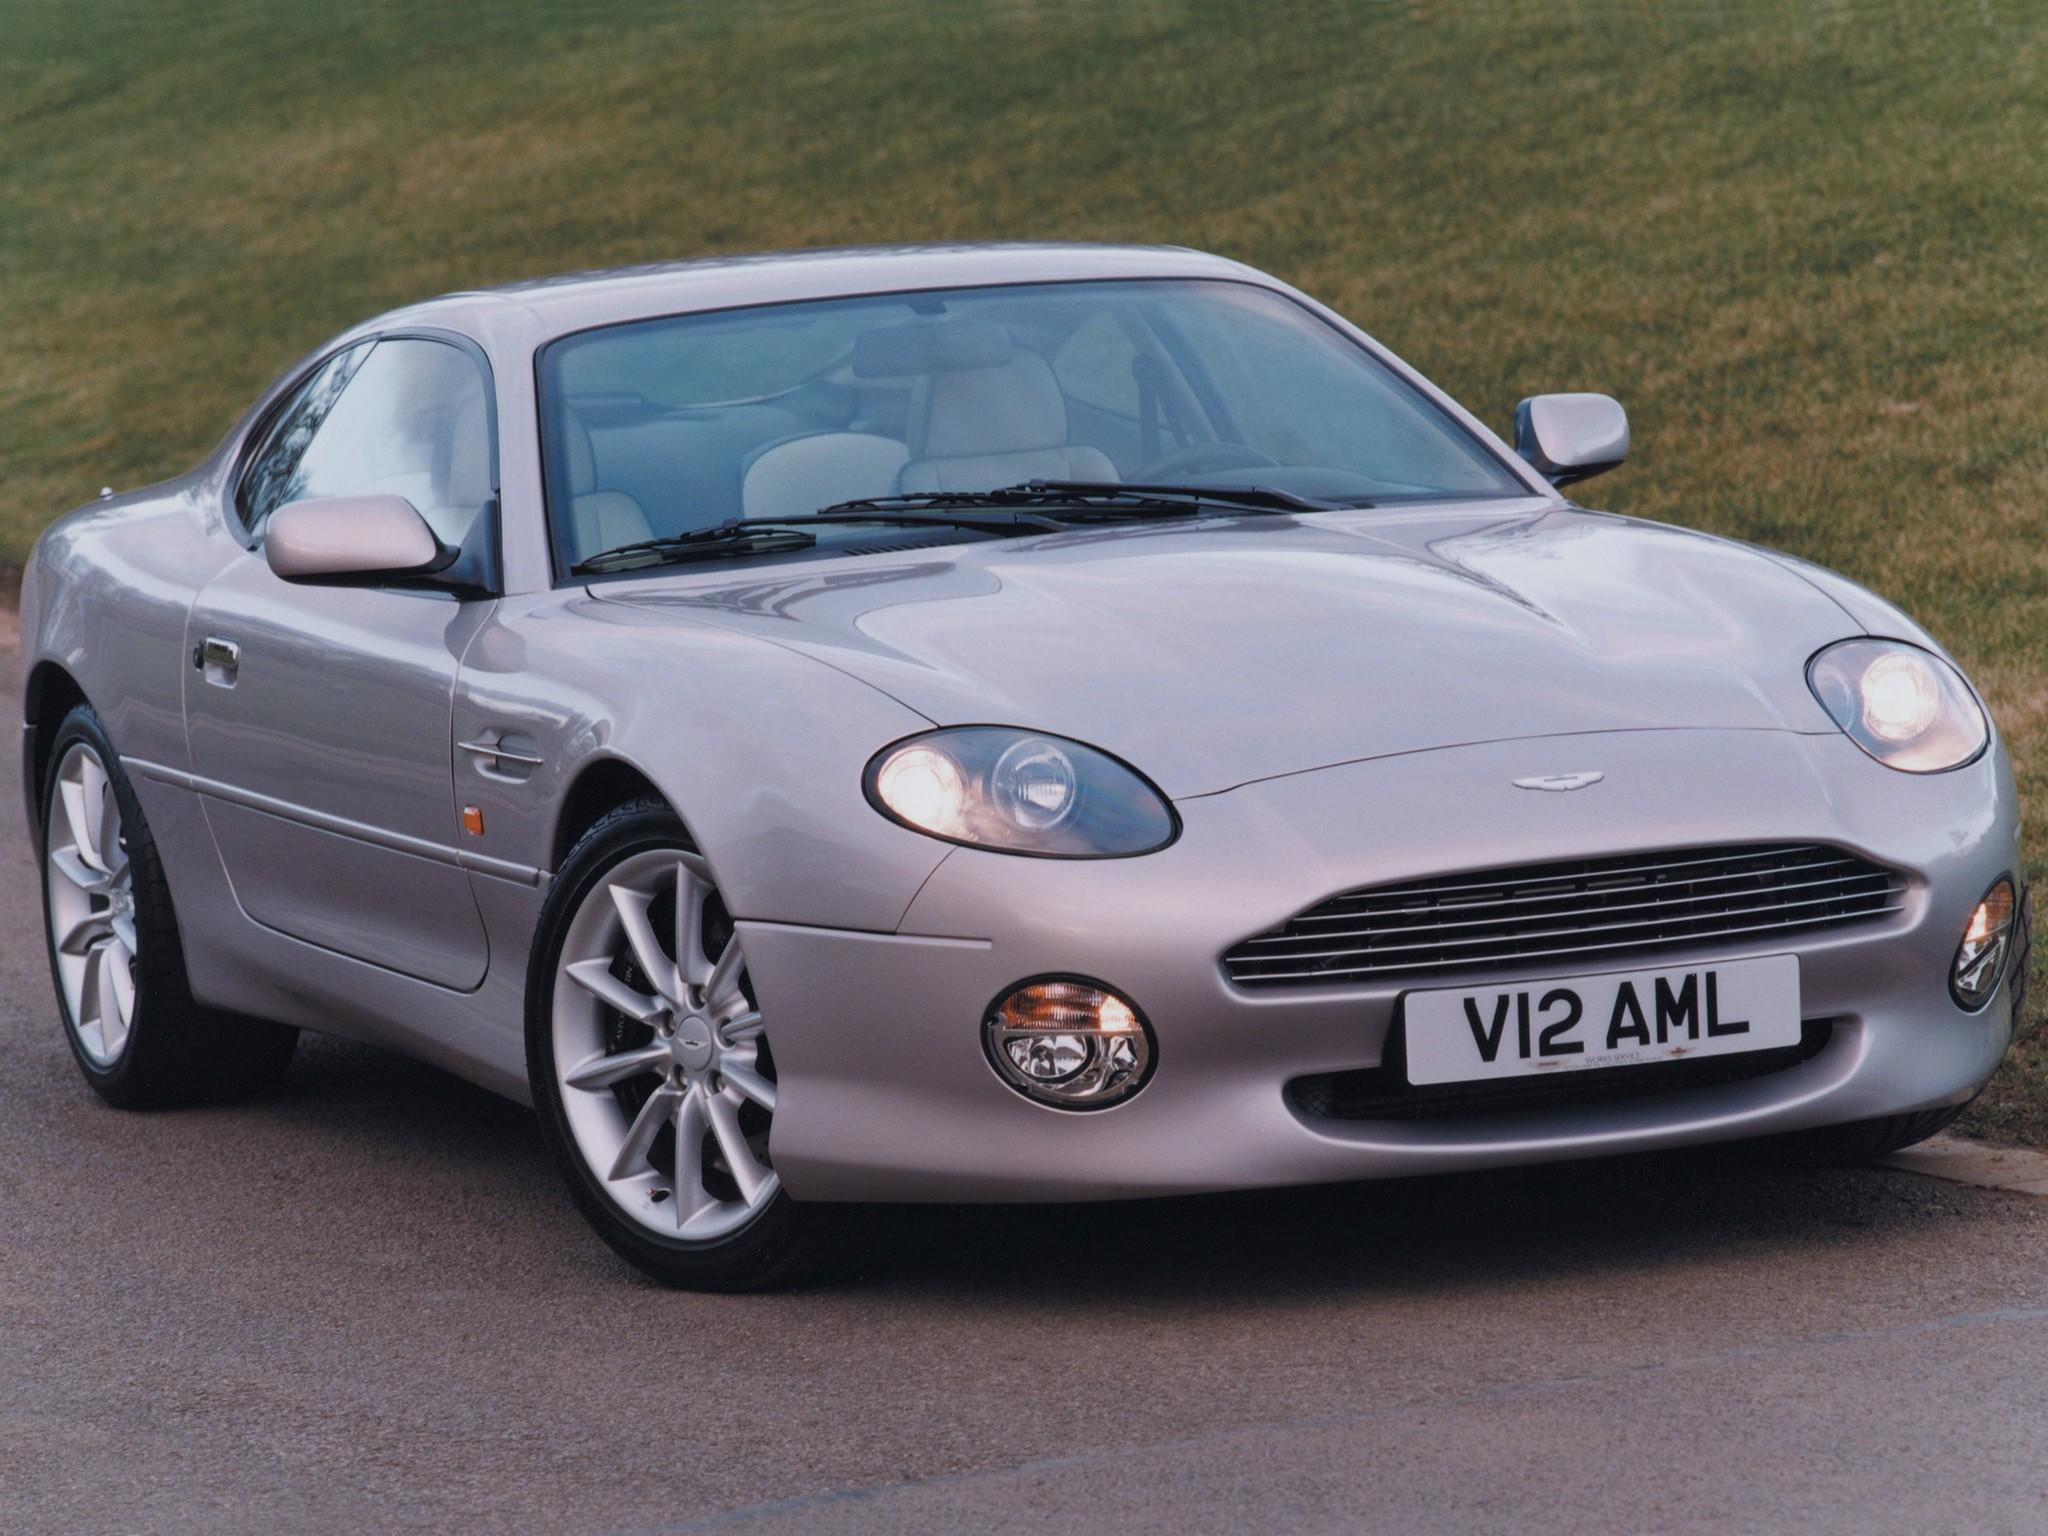 Aston Martin Db7 Vantage Specs Photos 1999 2000 2001 2002 2003 Autoevolution